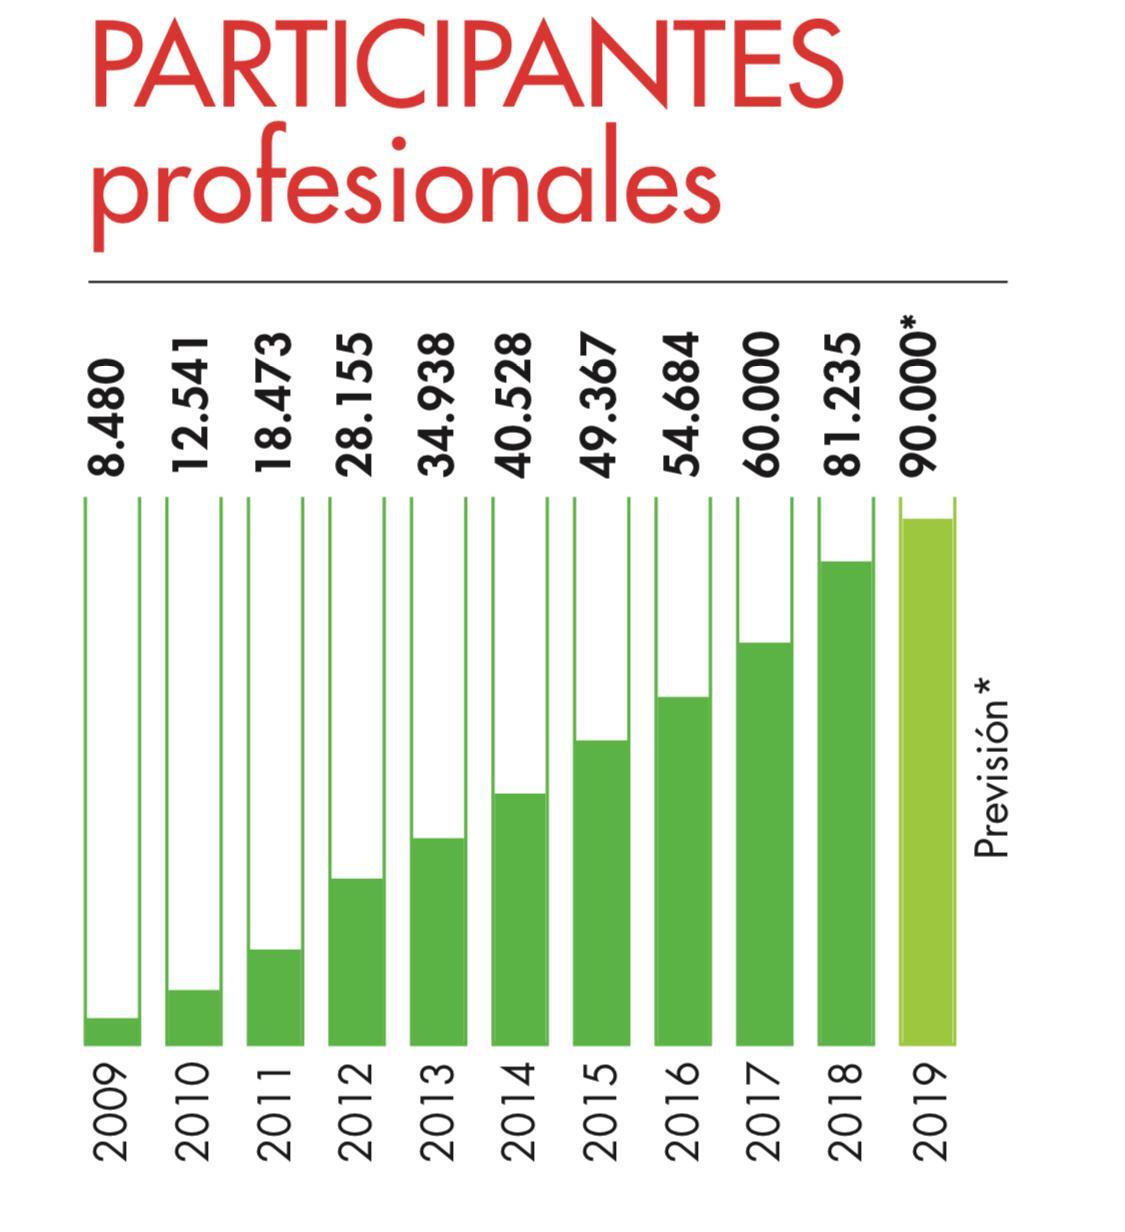 Participantes profesionales